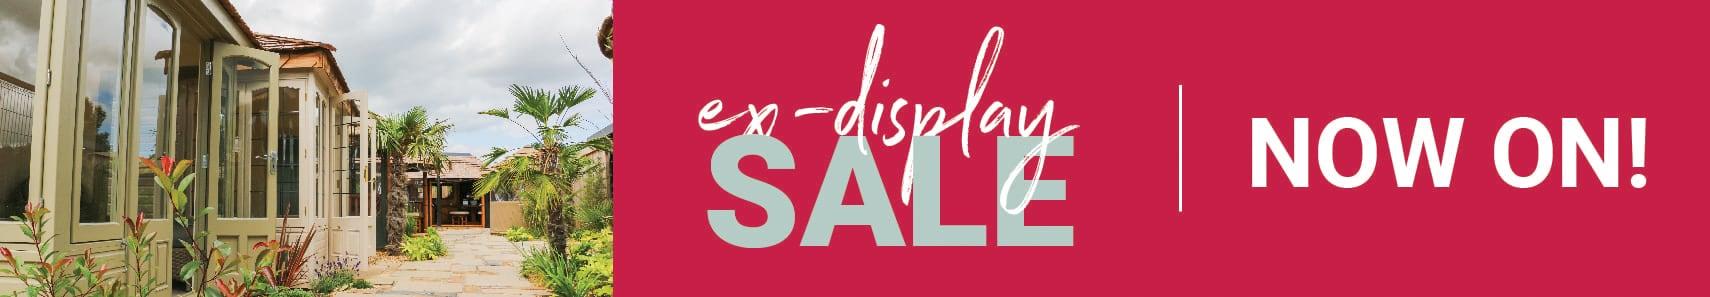 Ex-display sale now on!